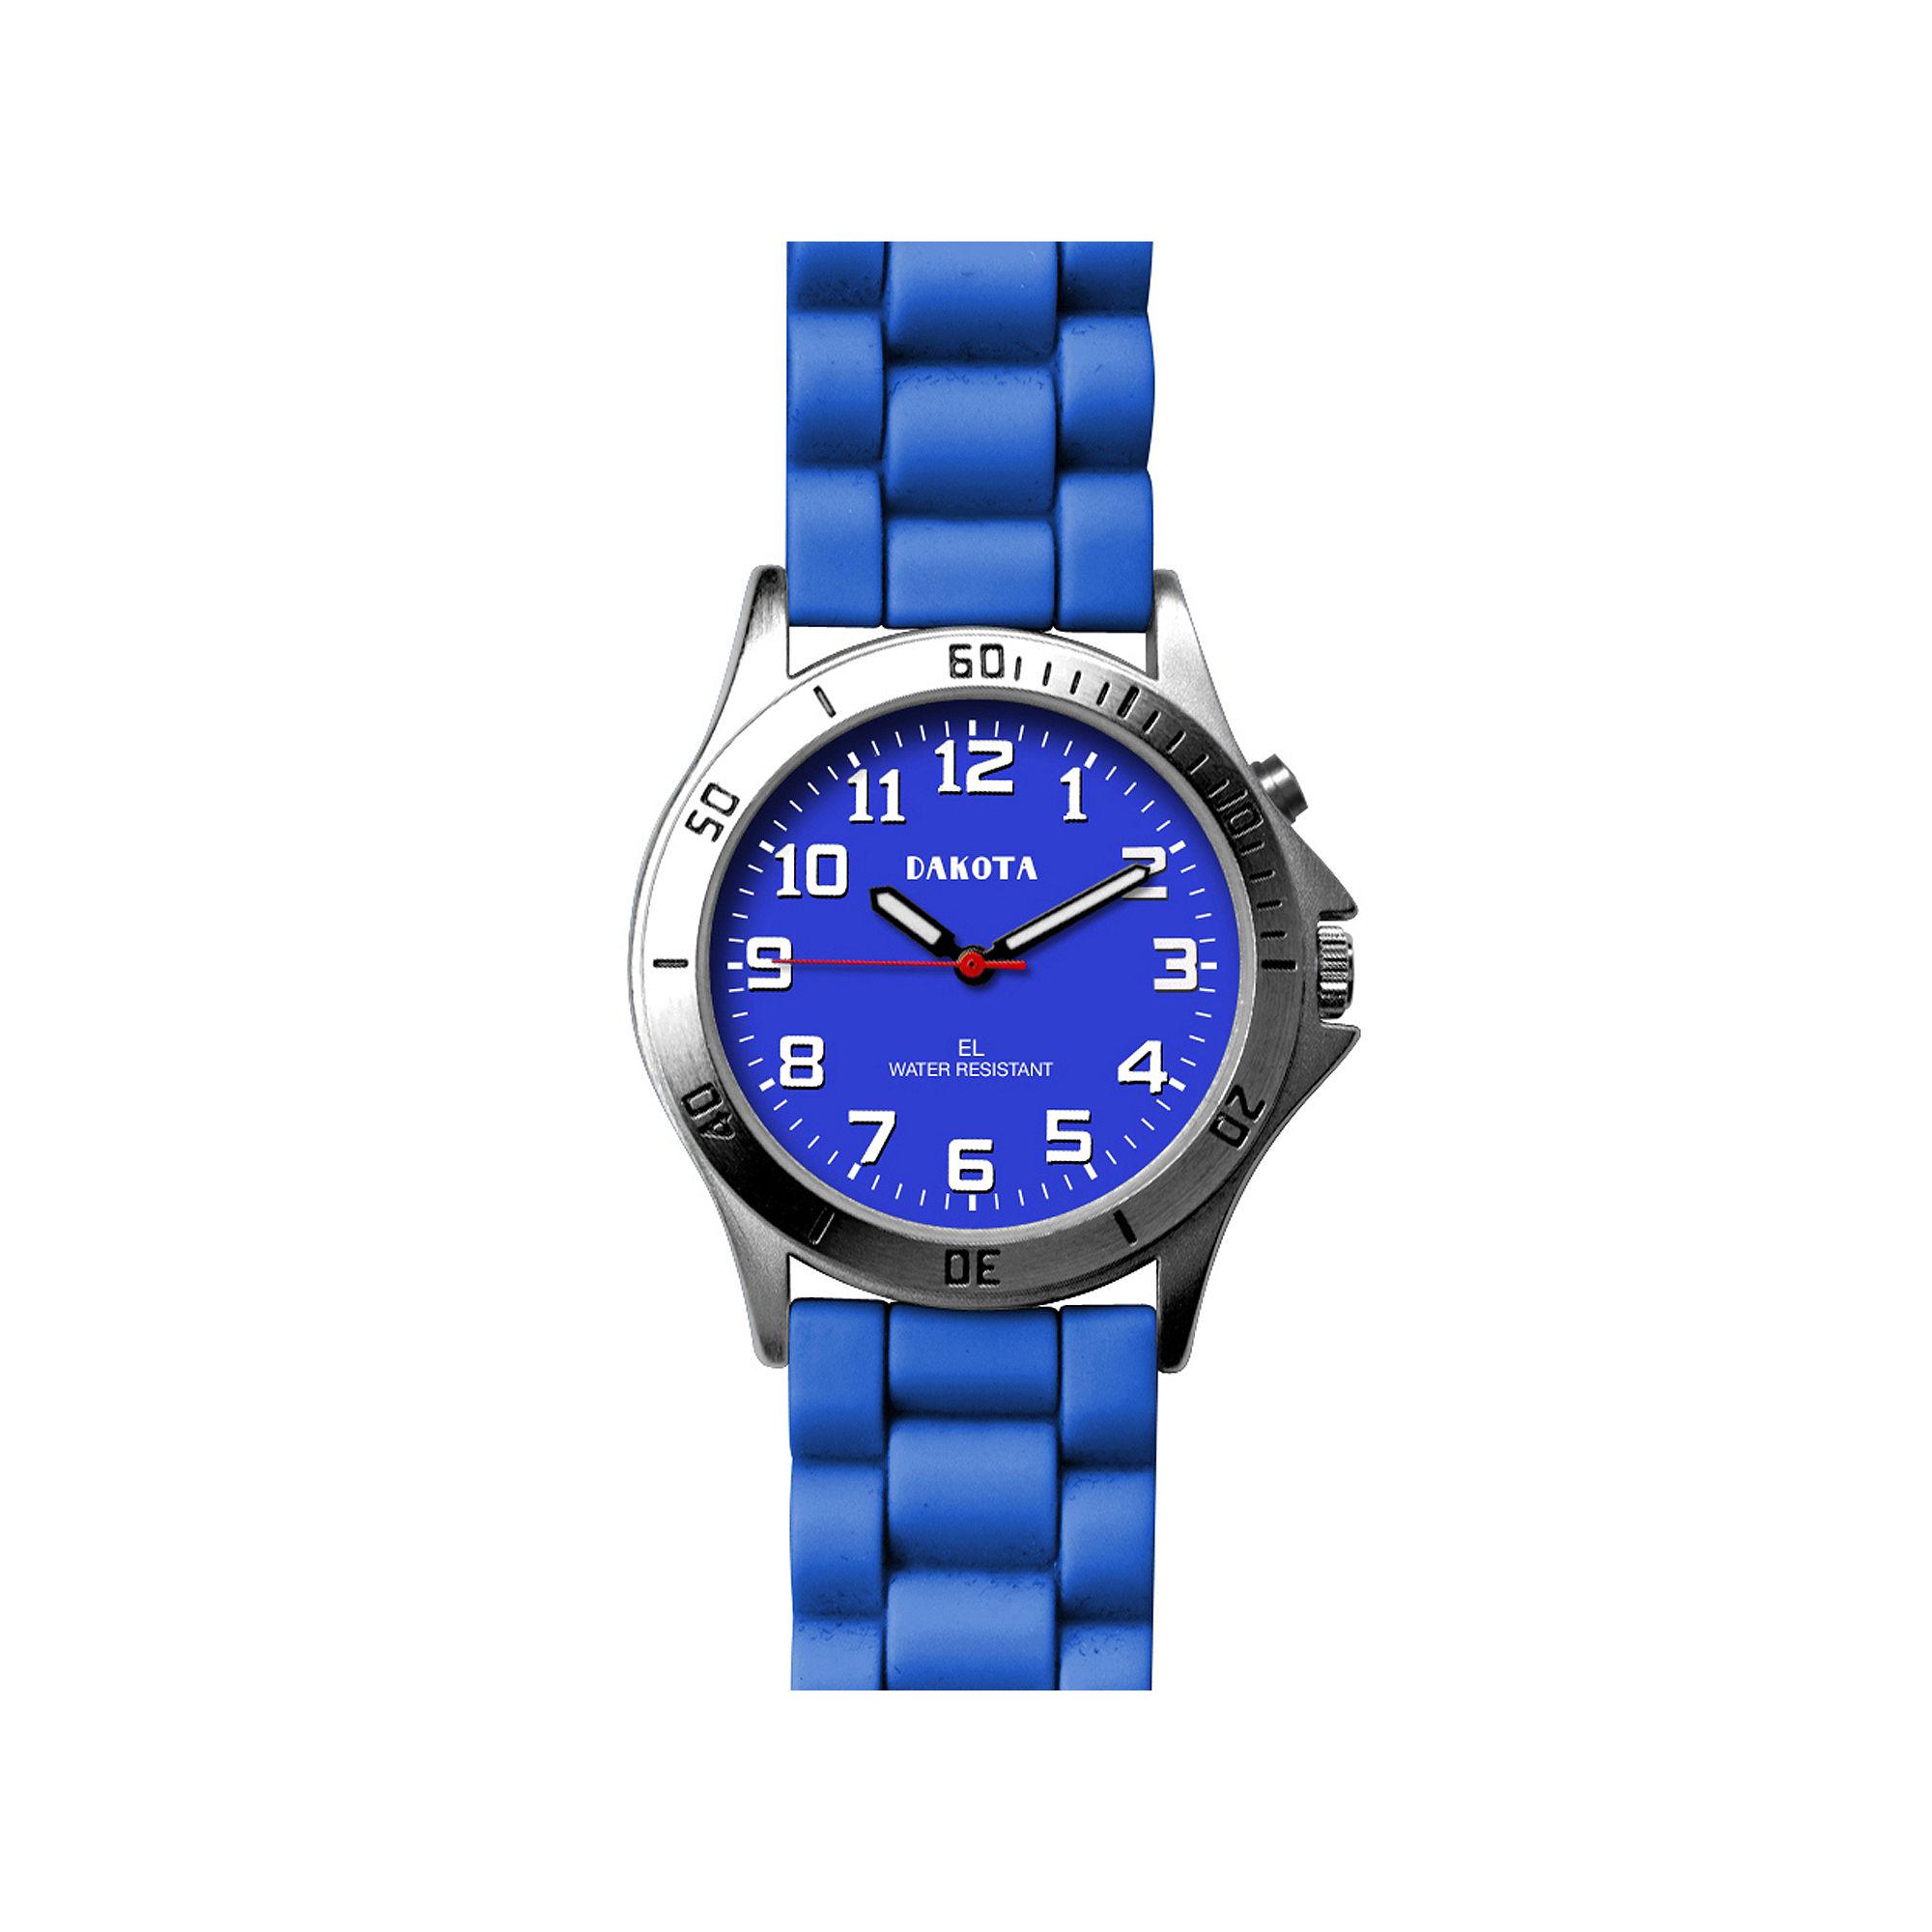 Dakota Women's Silicone Color EL Strap Watch, Blue